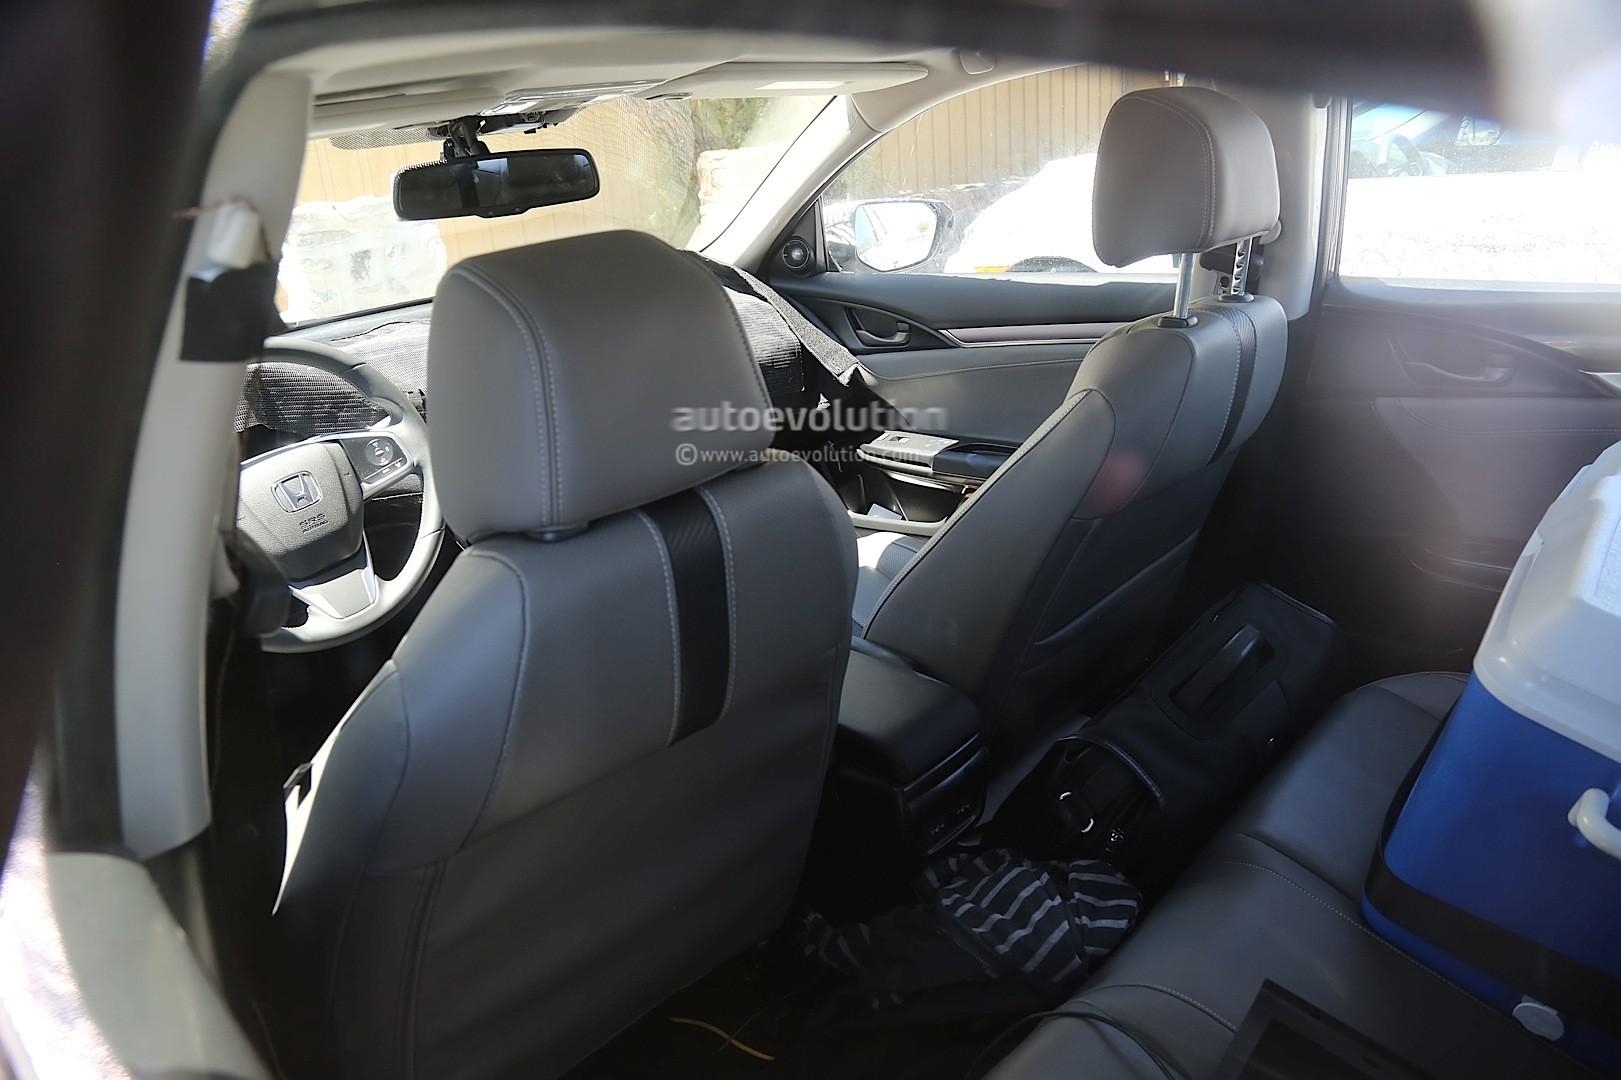 spyshots next gen 2017 honda civic sedan interior revealed new exterior details shown. Black Bedroom Furniture Sets. Home Design Ideas